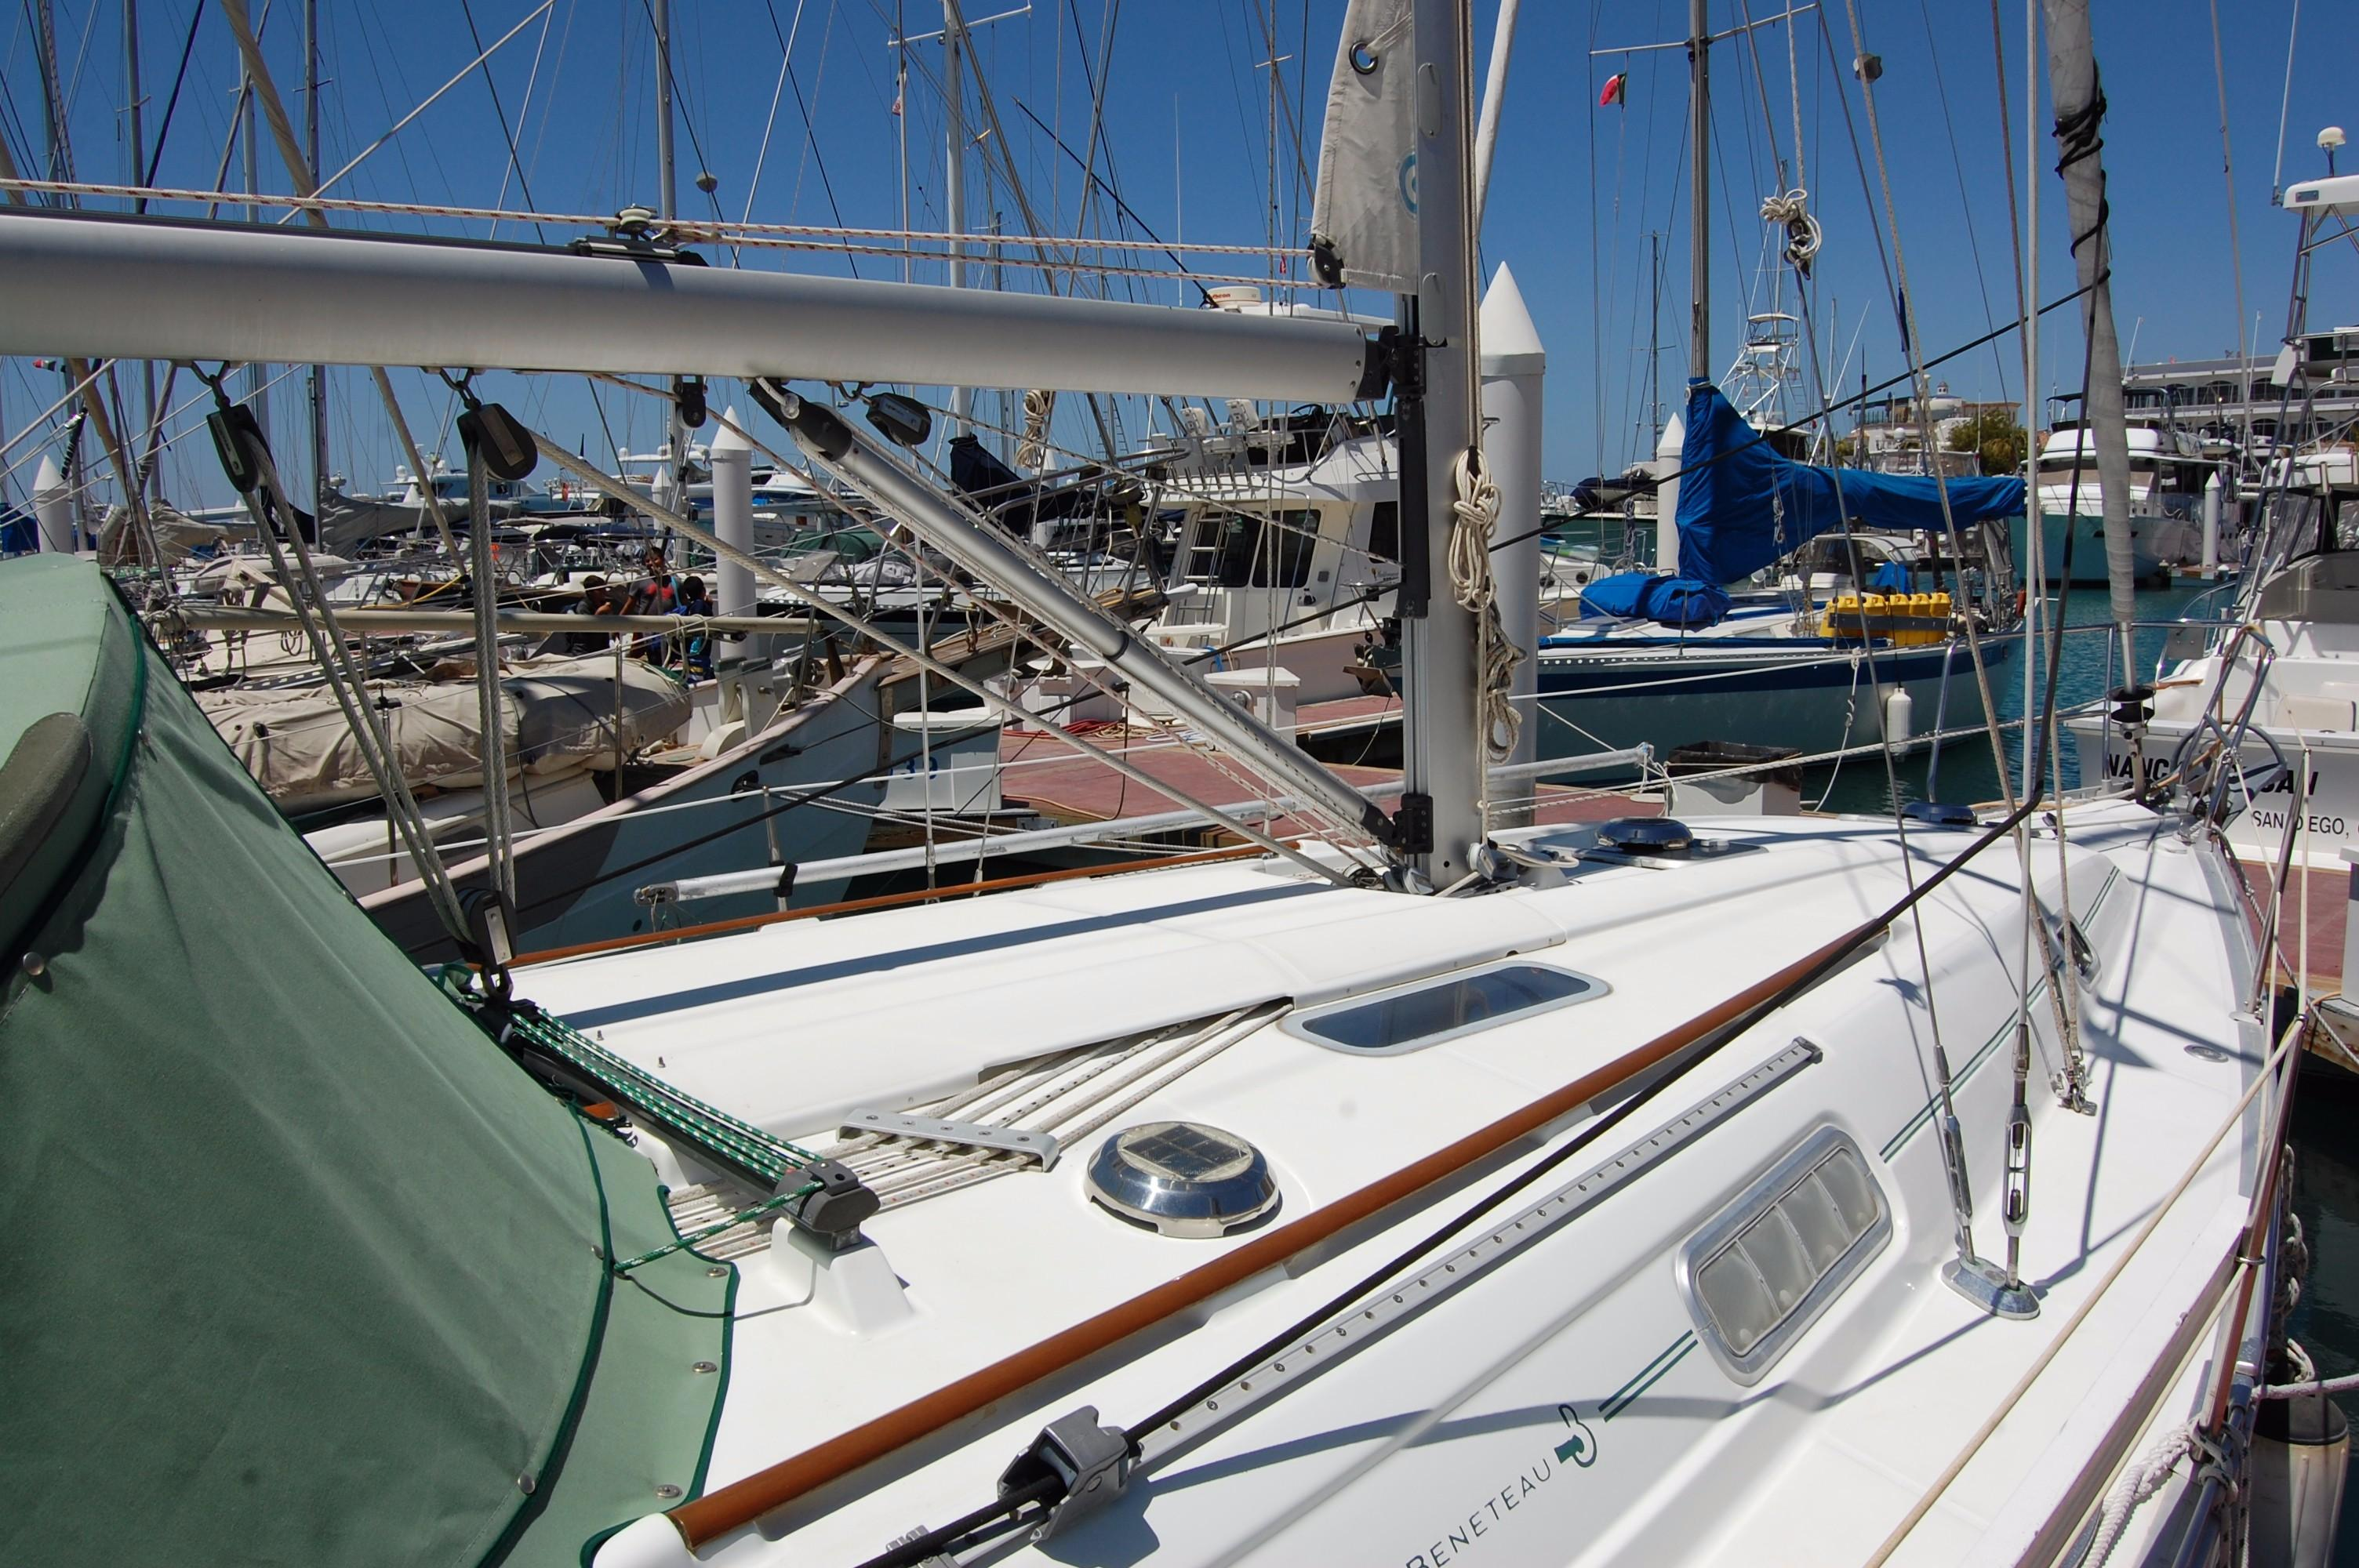 35' Beneteau Oceanis 351+Photo 8